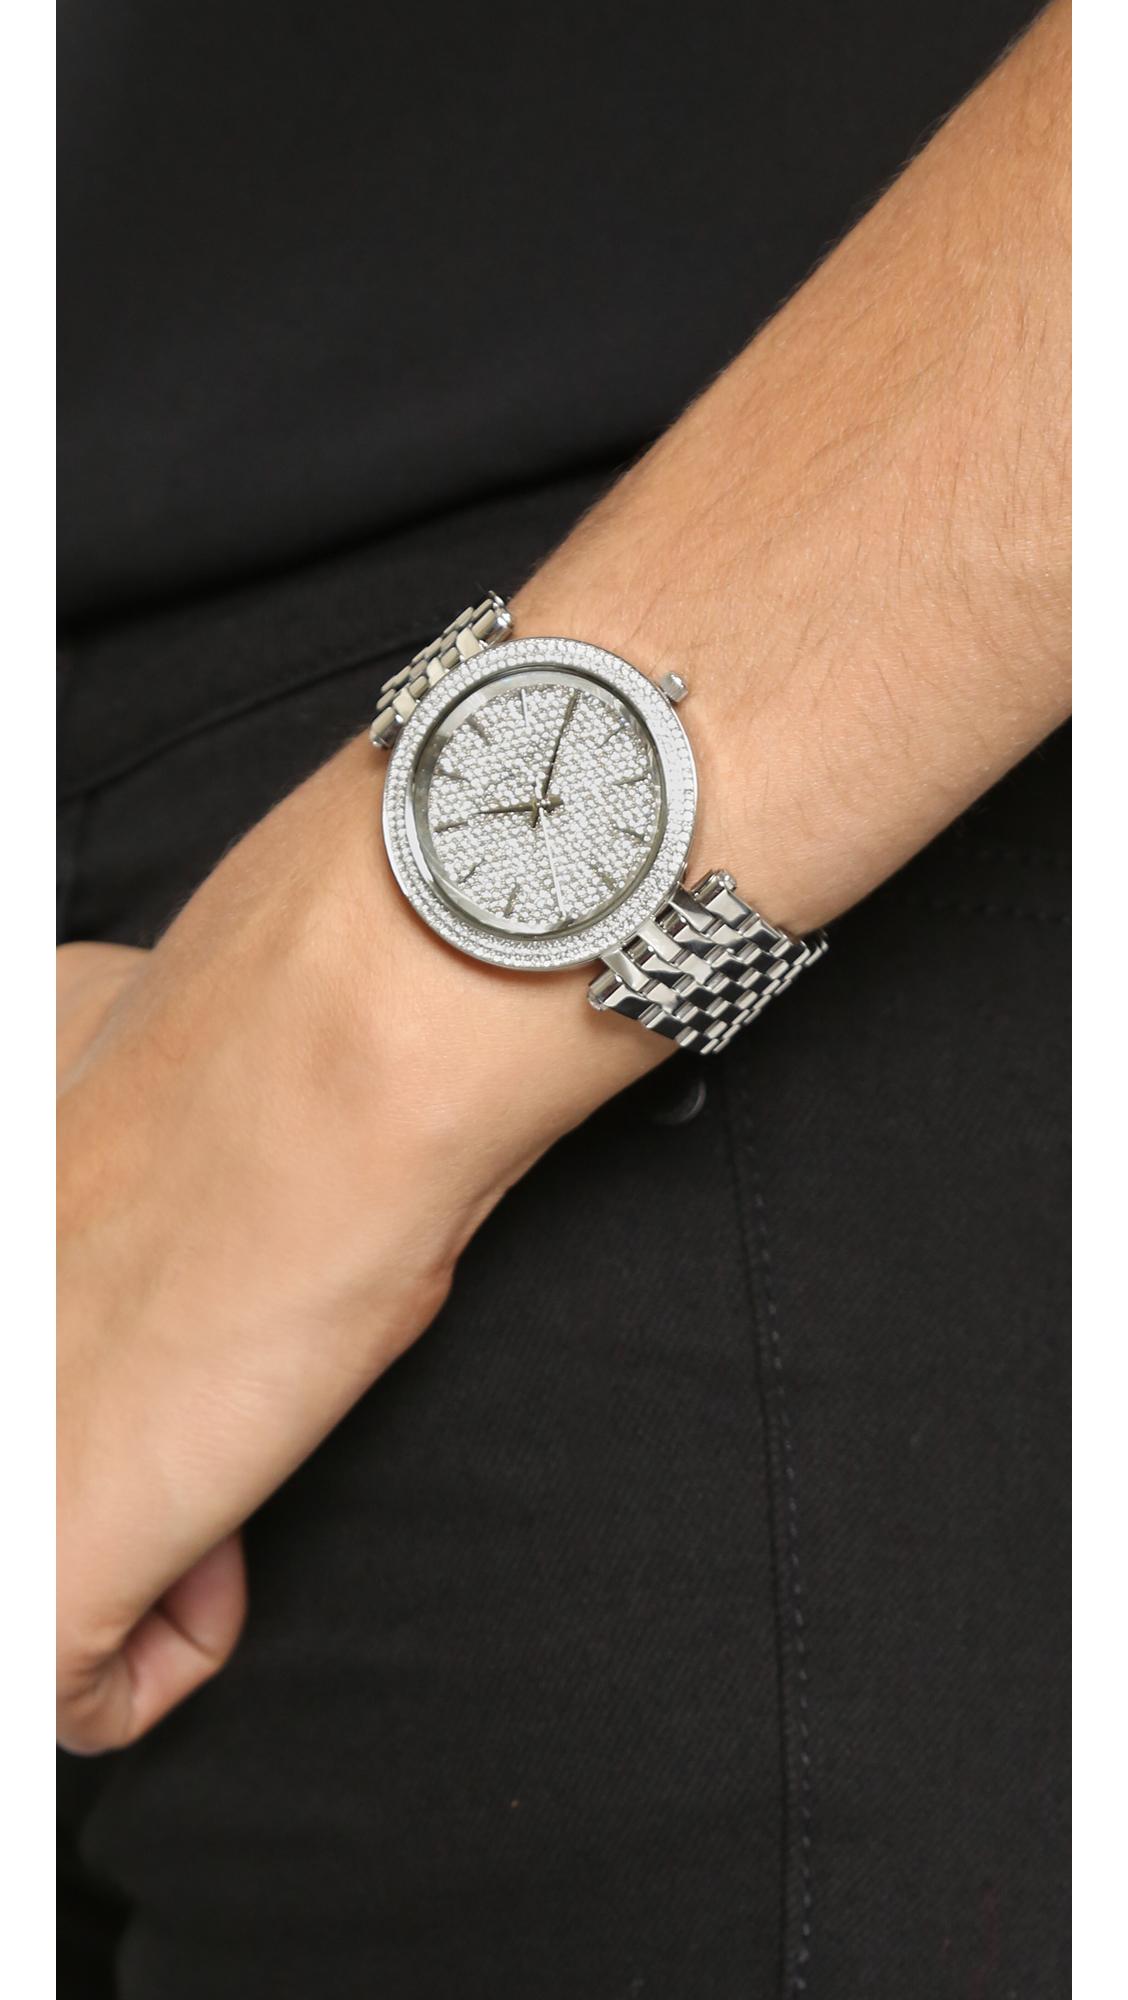 7141a5cdae42 Michael Kors Darci Watch - Silver in Metallic - Lyst